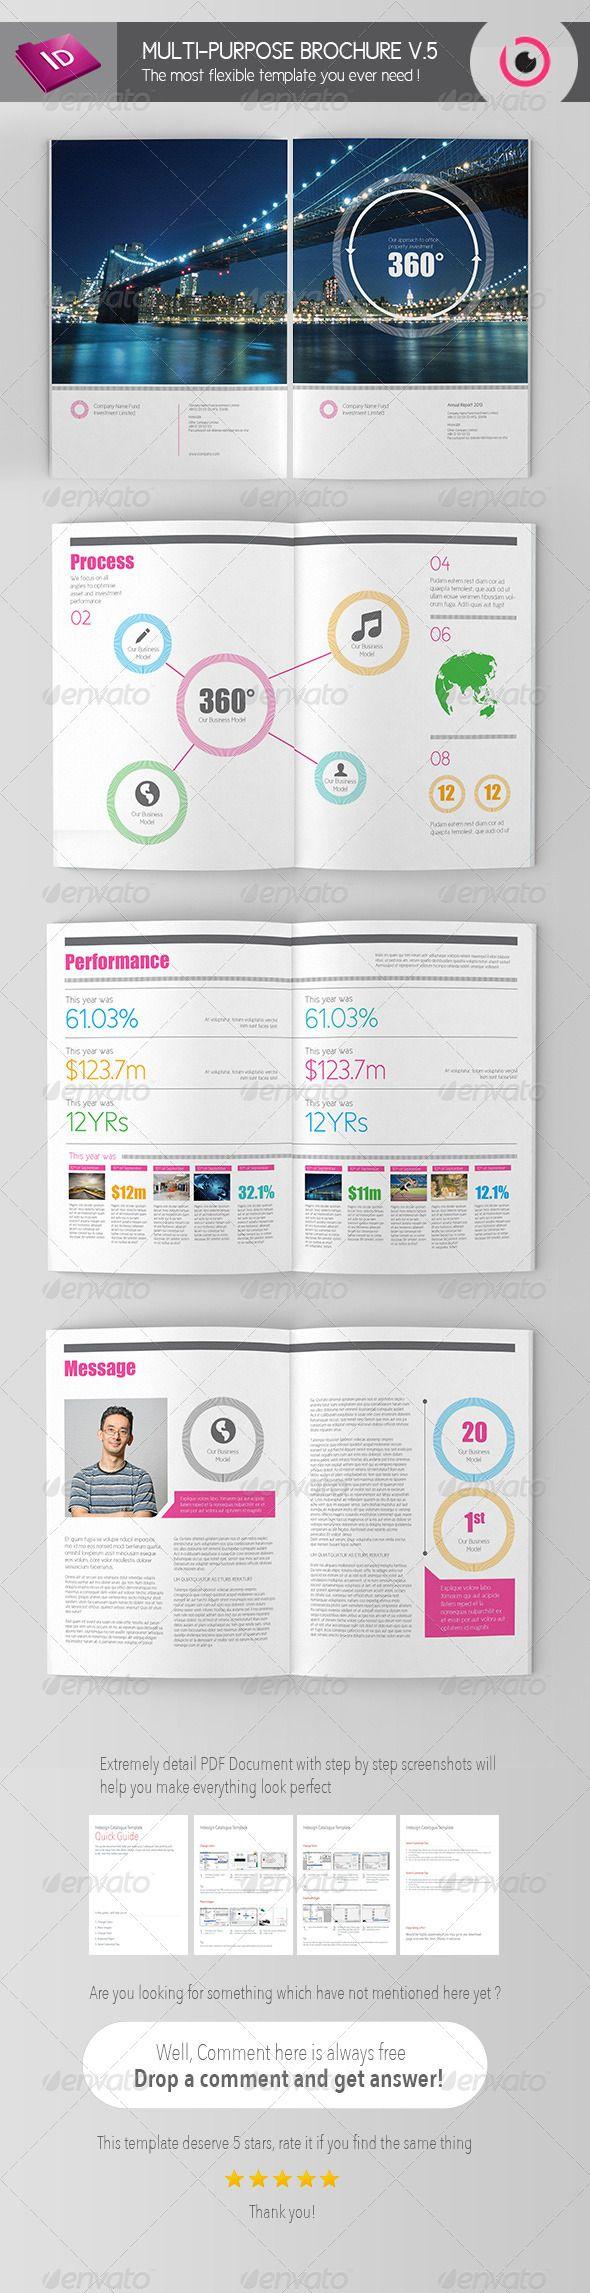 multi page brochure template - multi purpose brochure template v 5 simple dark and fonts